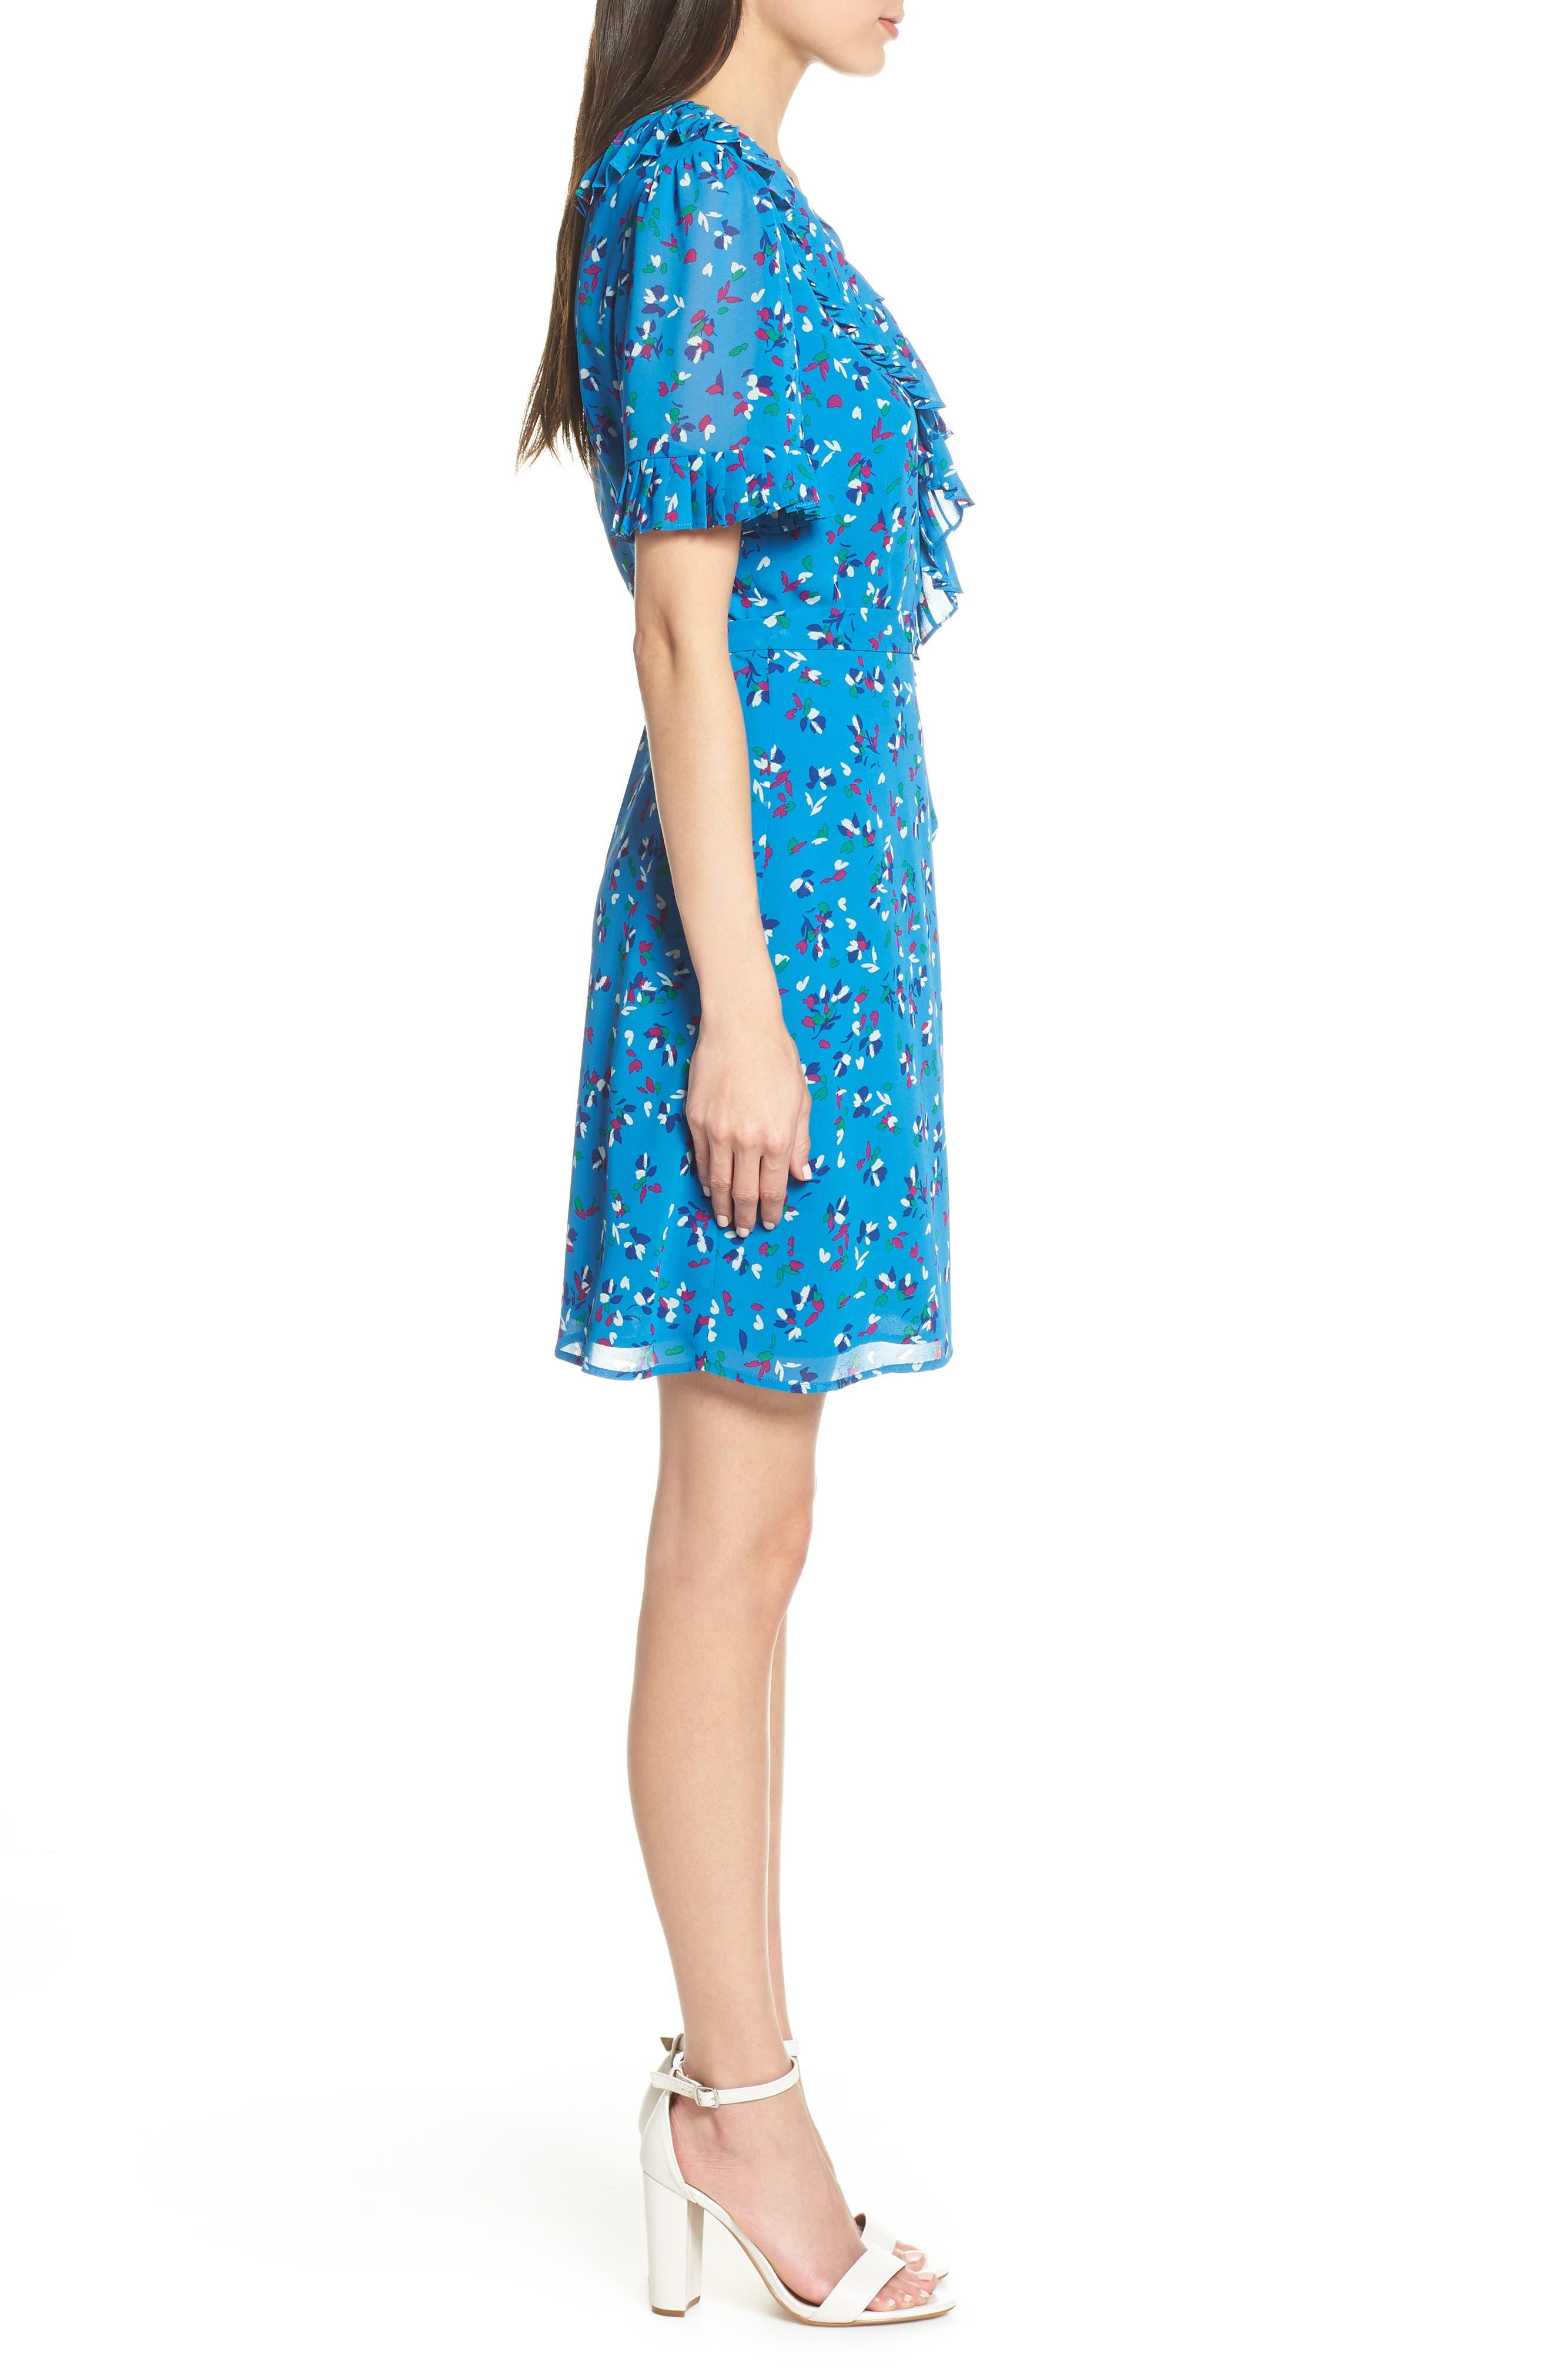 CHARLES HENRY, Pleat Neck Wrap Dress, Alternate thumbnail 5, color, BLUE FLORAL DITZY